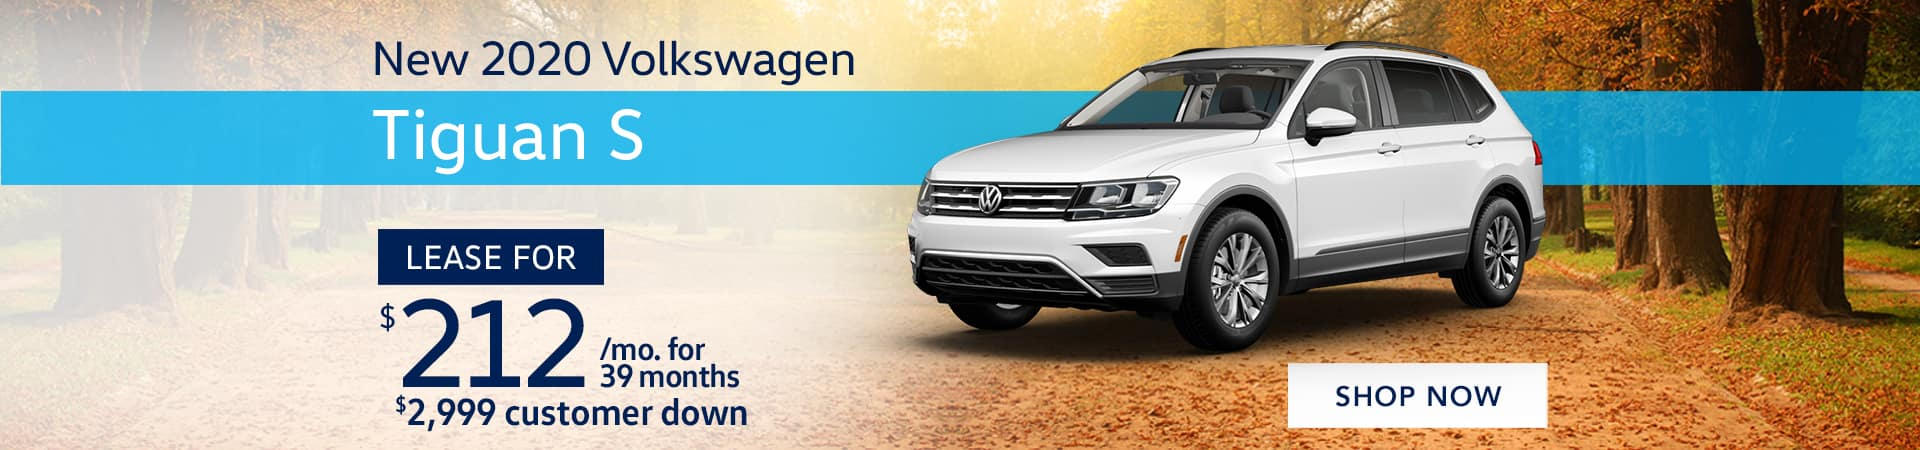 BVW_1920x450_New 2020 Volkswagen TiguanS _10_20